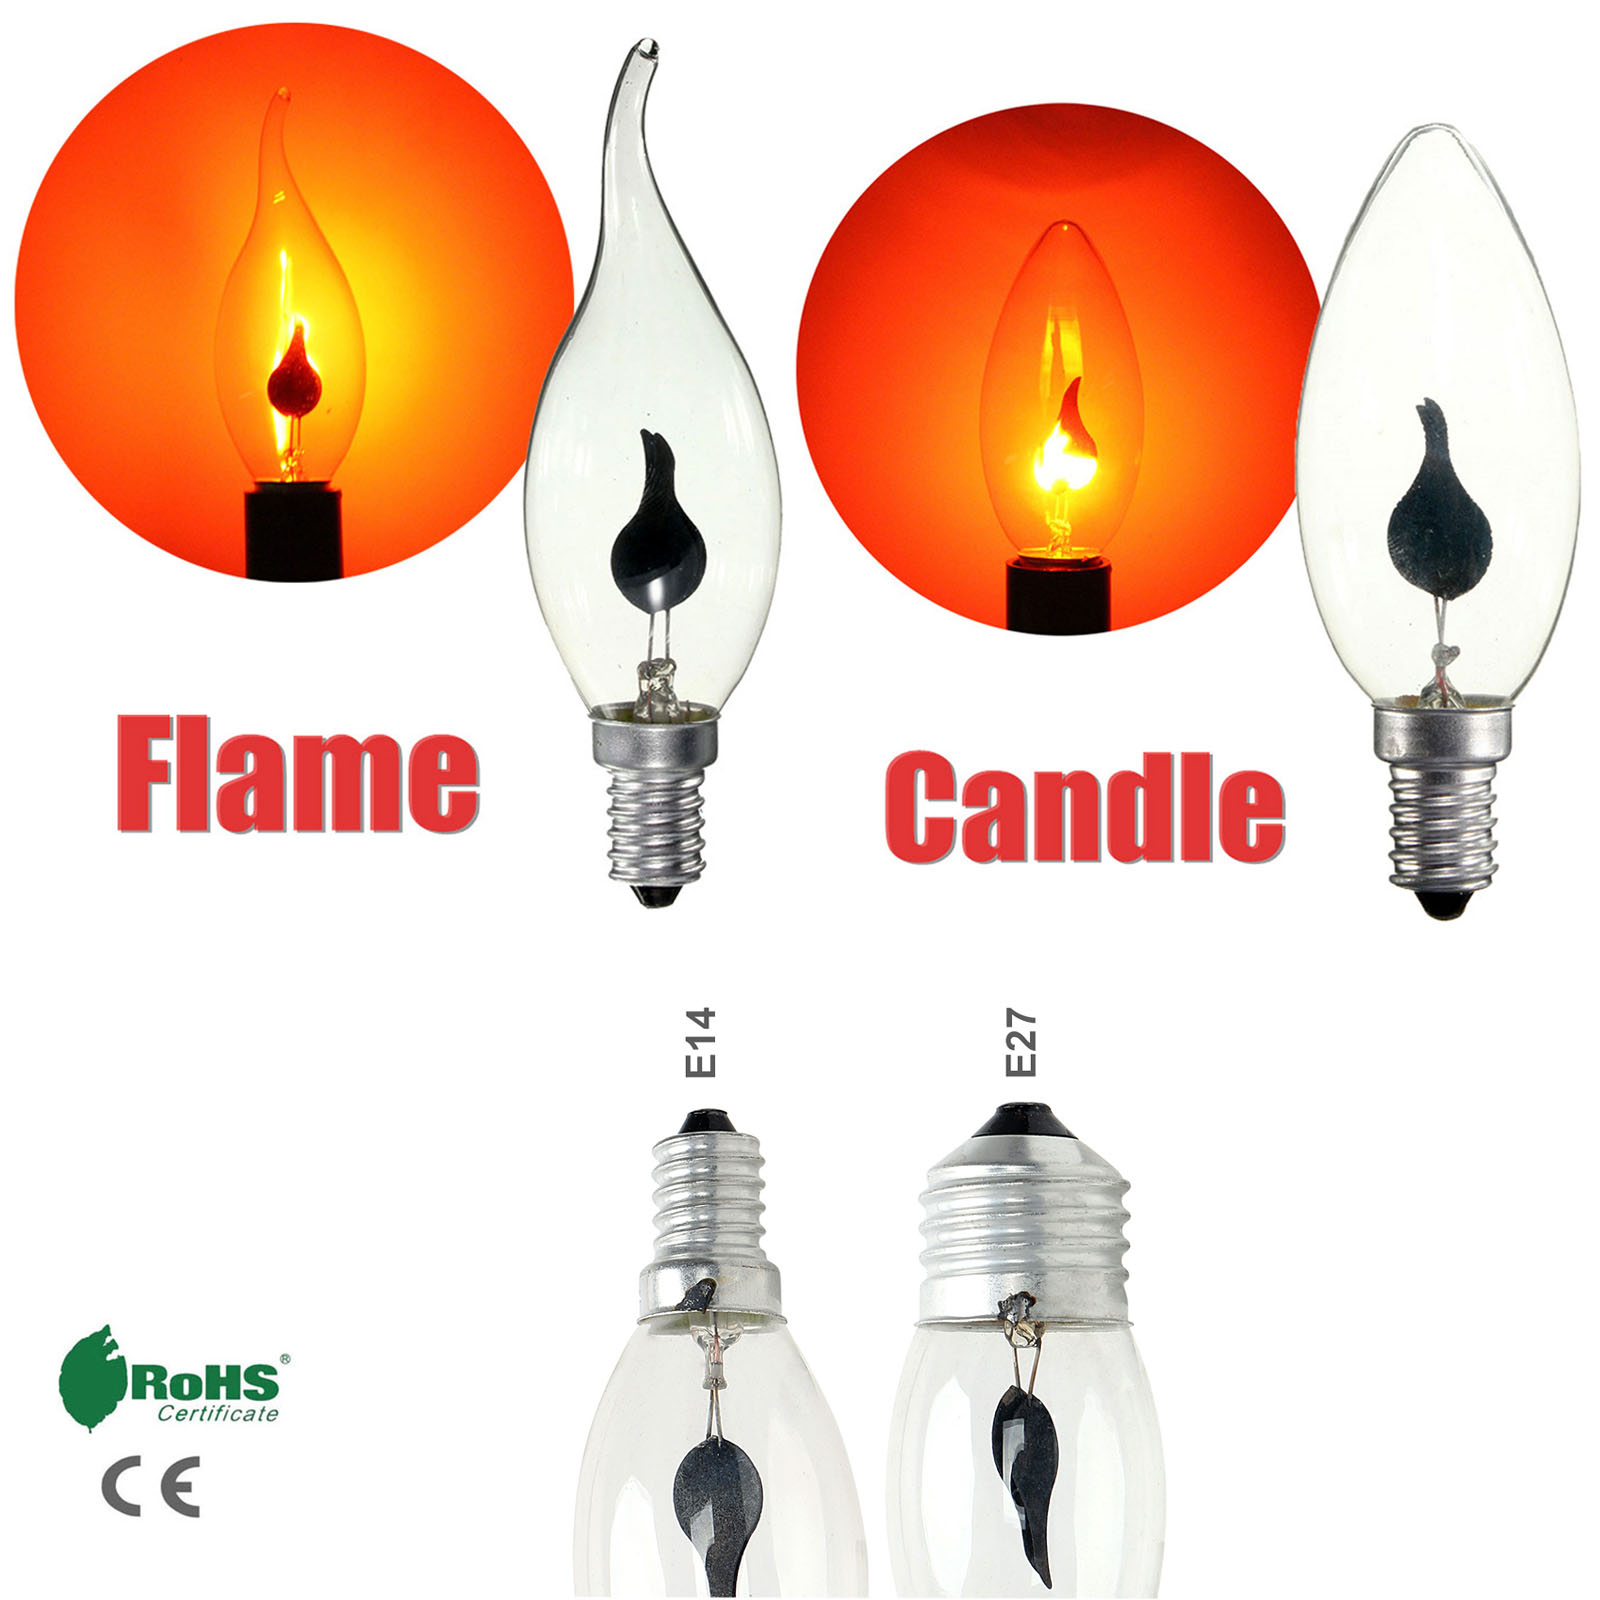 LED Flame Tip Candle Simulated Nature Fire Flickering Light E14 E27 3W Filament Bulb Vintage Bar Pub Home Decor Lamp 220V